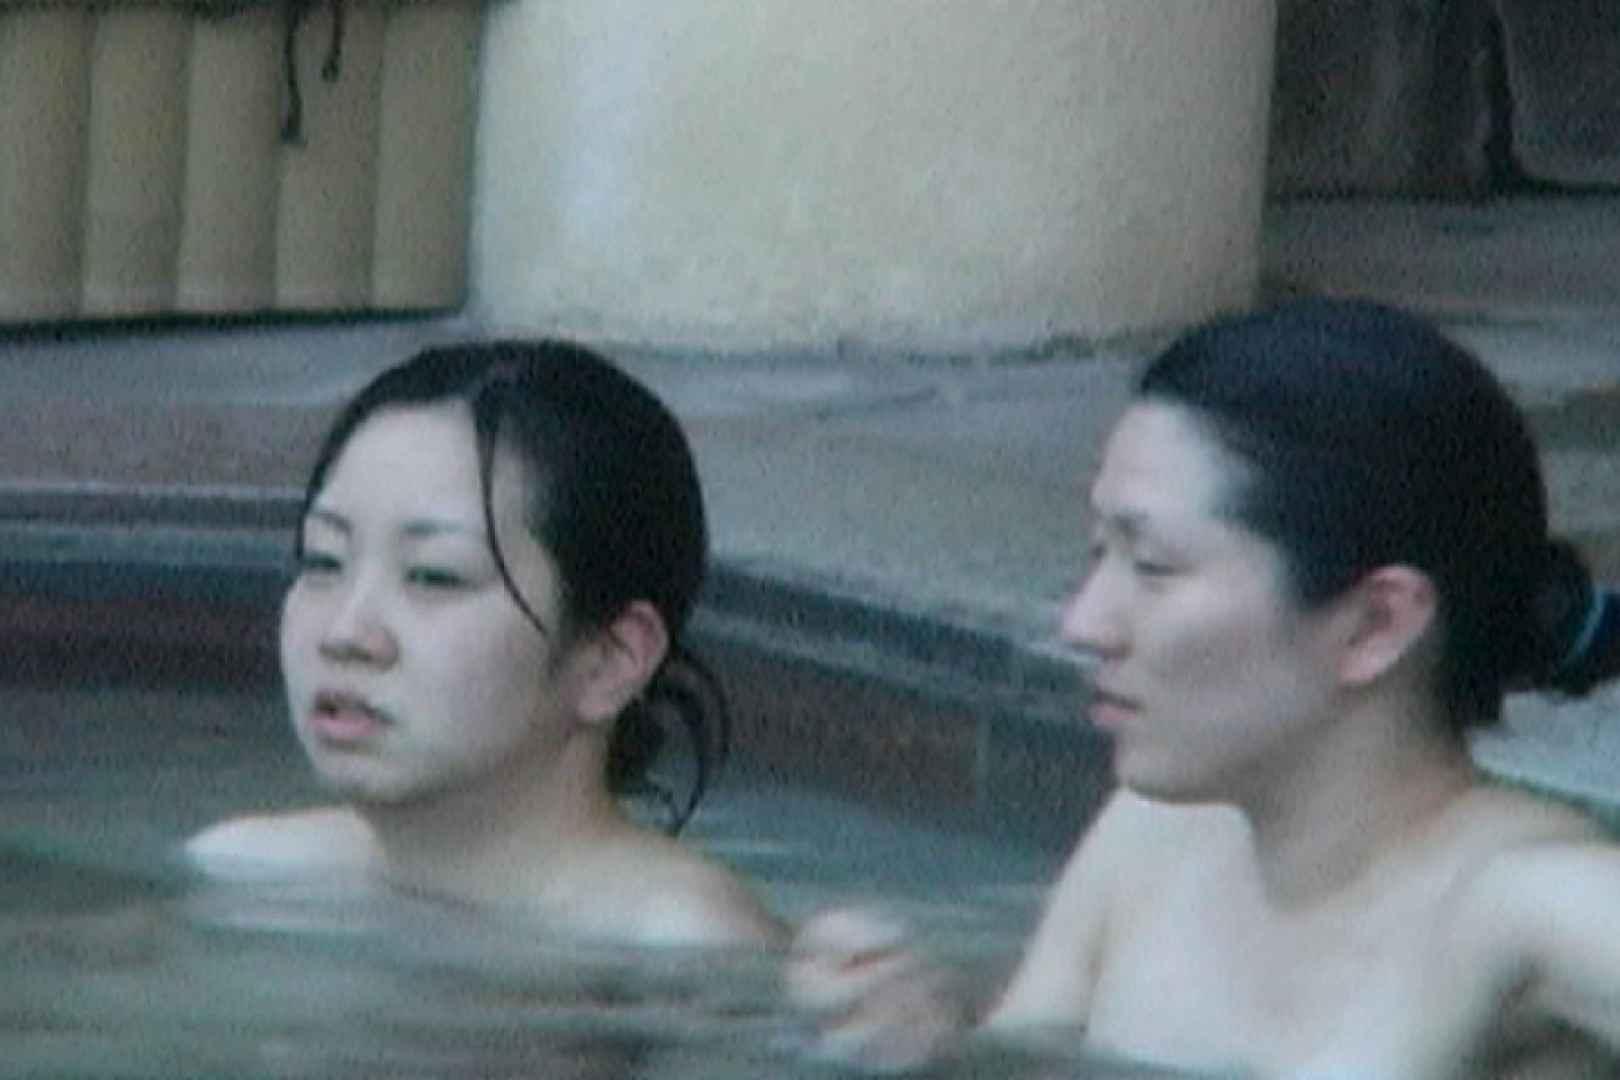 Aquaな露天風呂Vol.598 HなOL | 露天  55pic 17